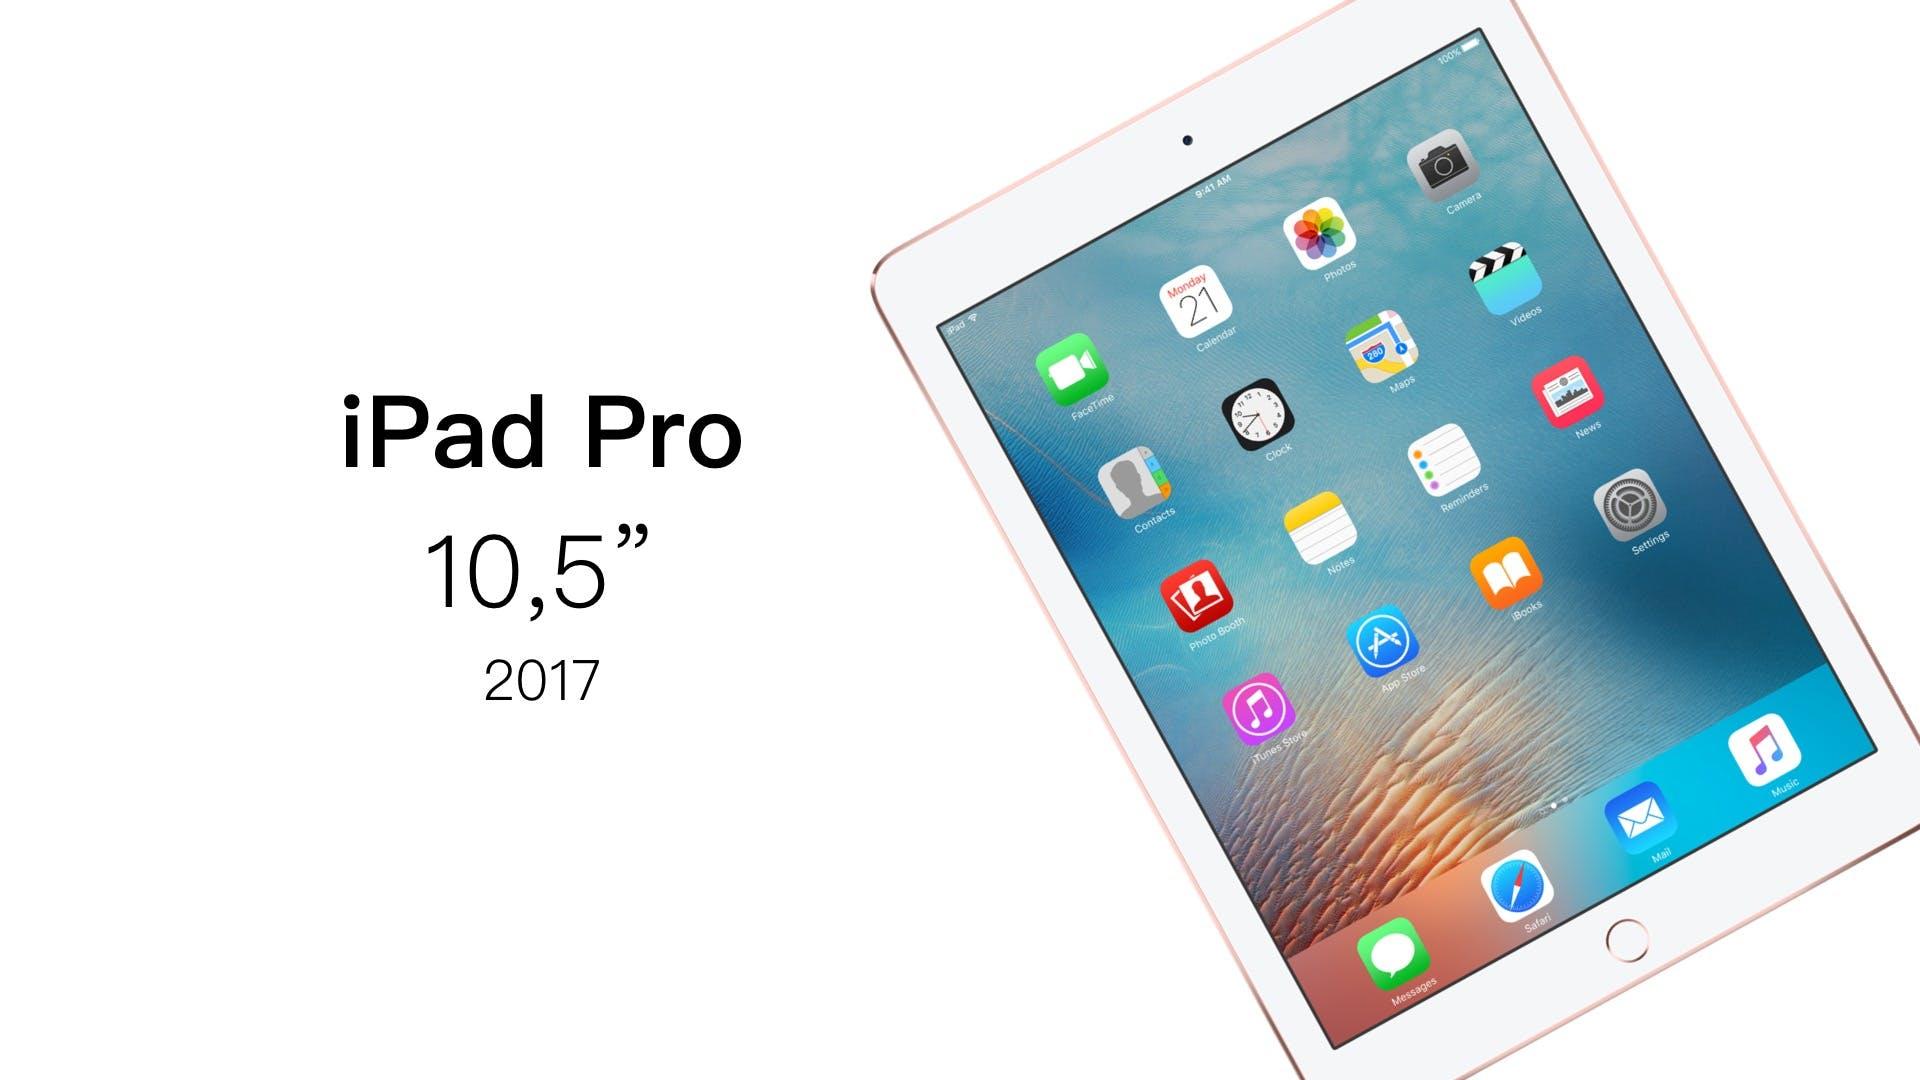 "10.5"", 2017, apple"